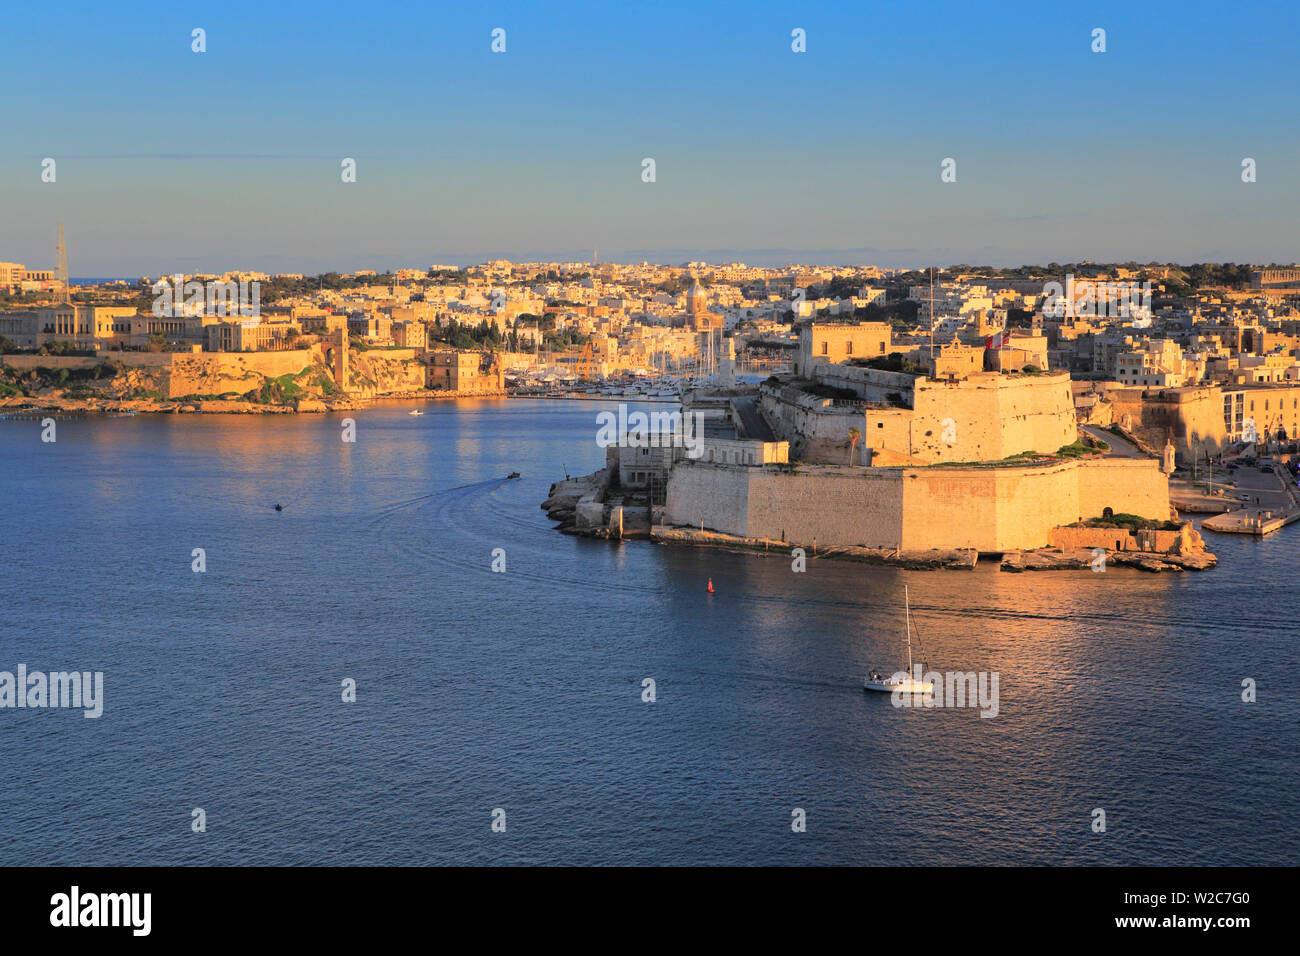 La Valletta, view from Upper Barracca gardens to Fort Saint Angelo, Malta - Stock Image